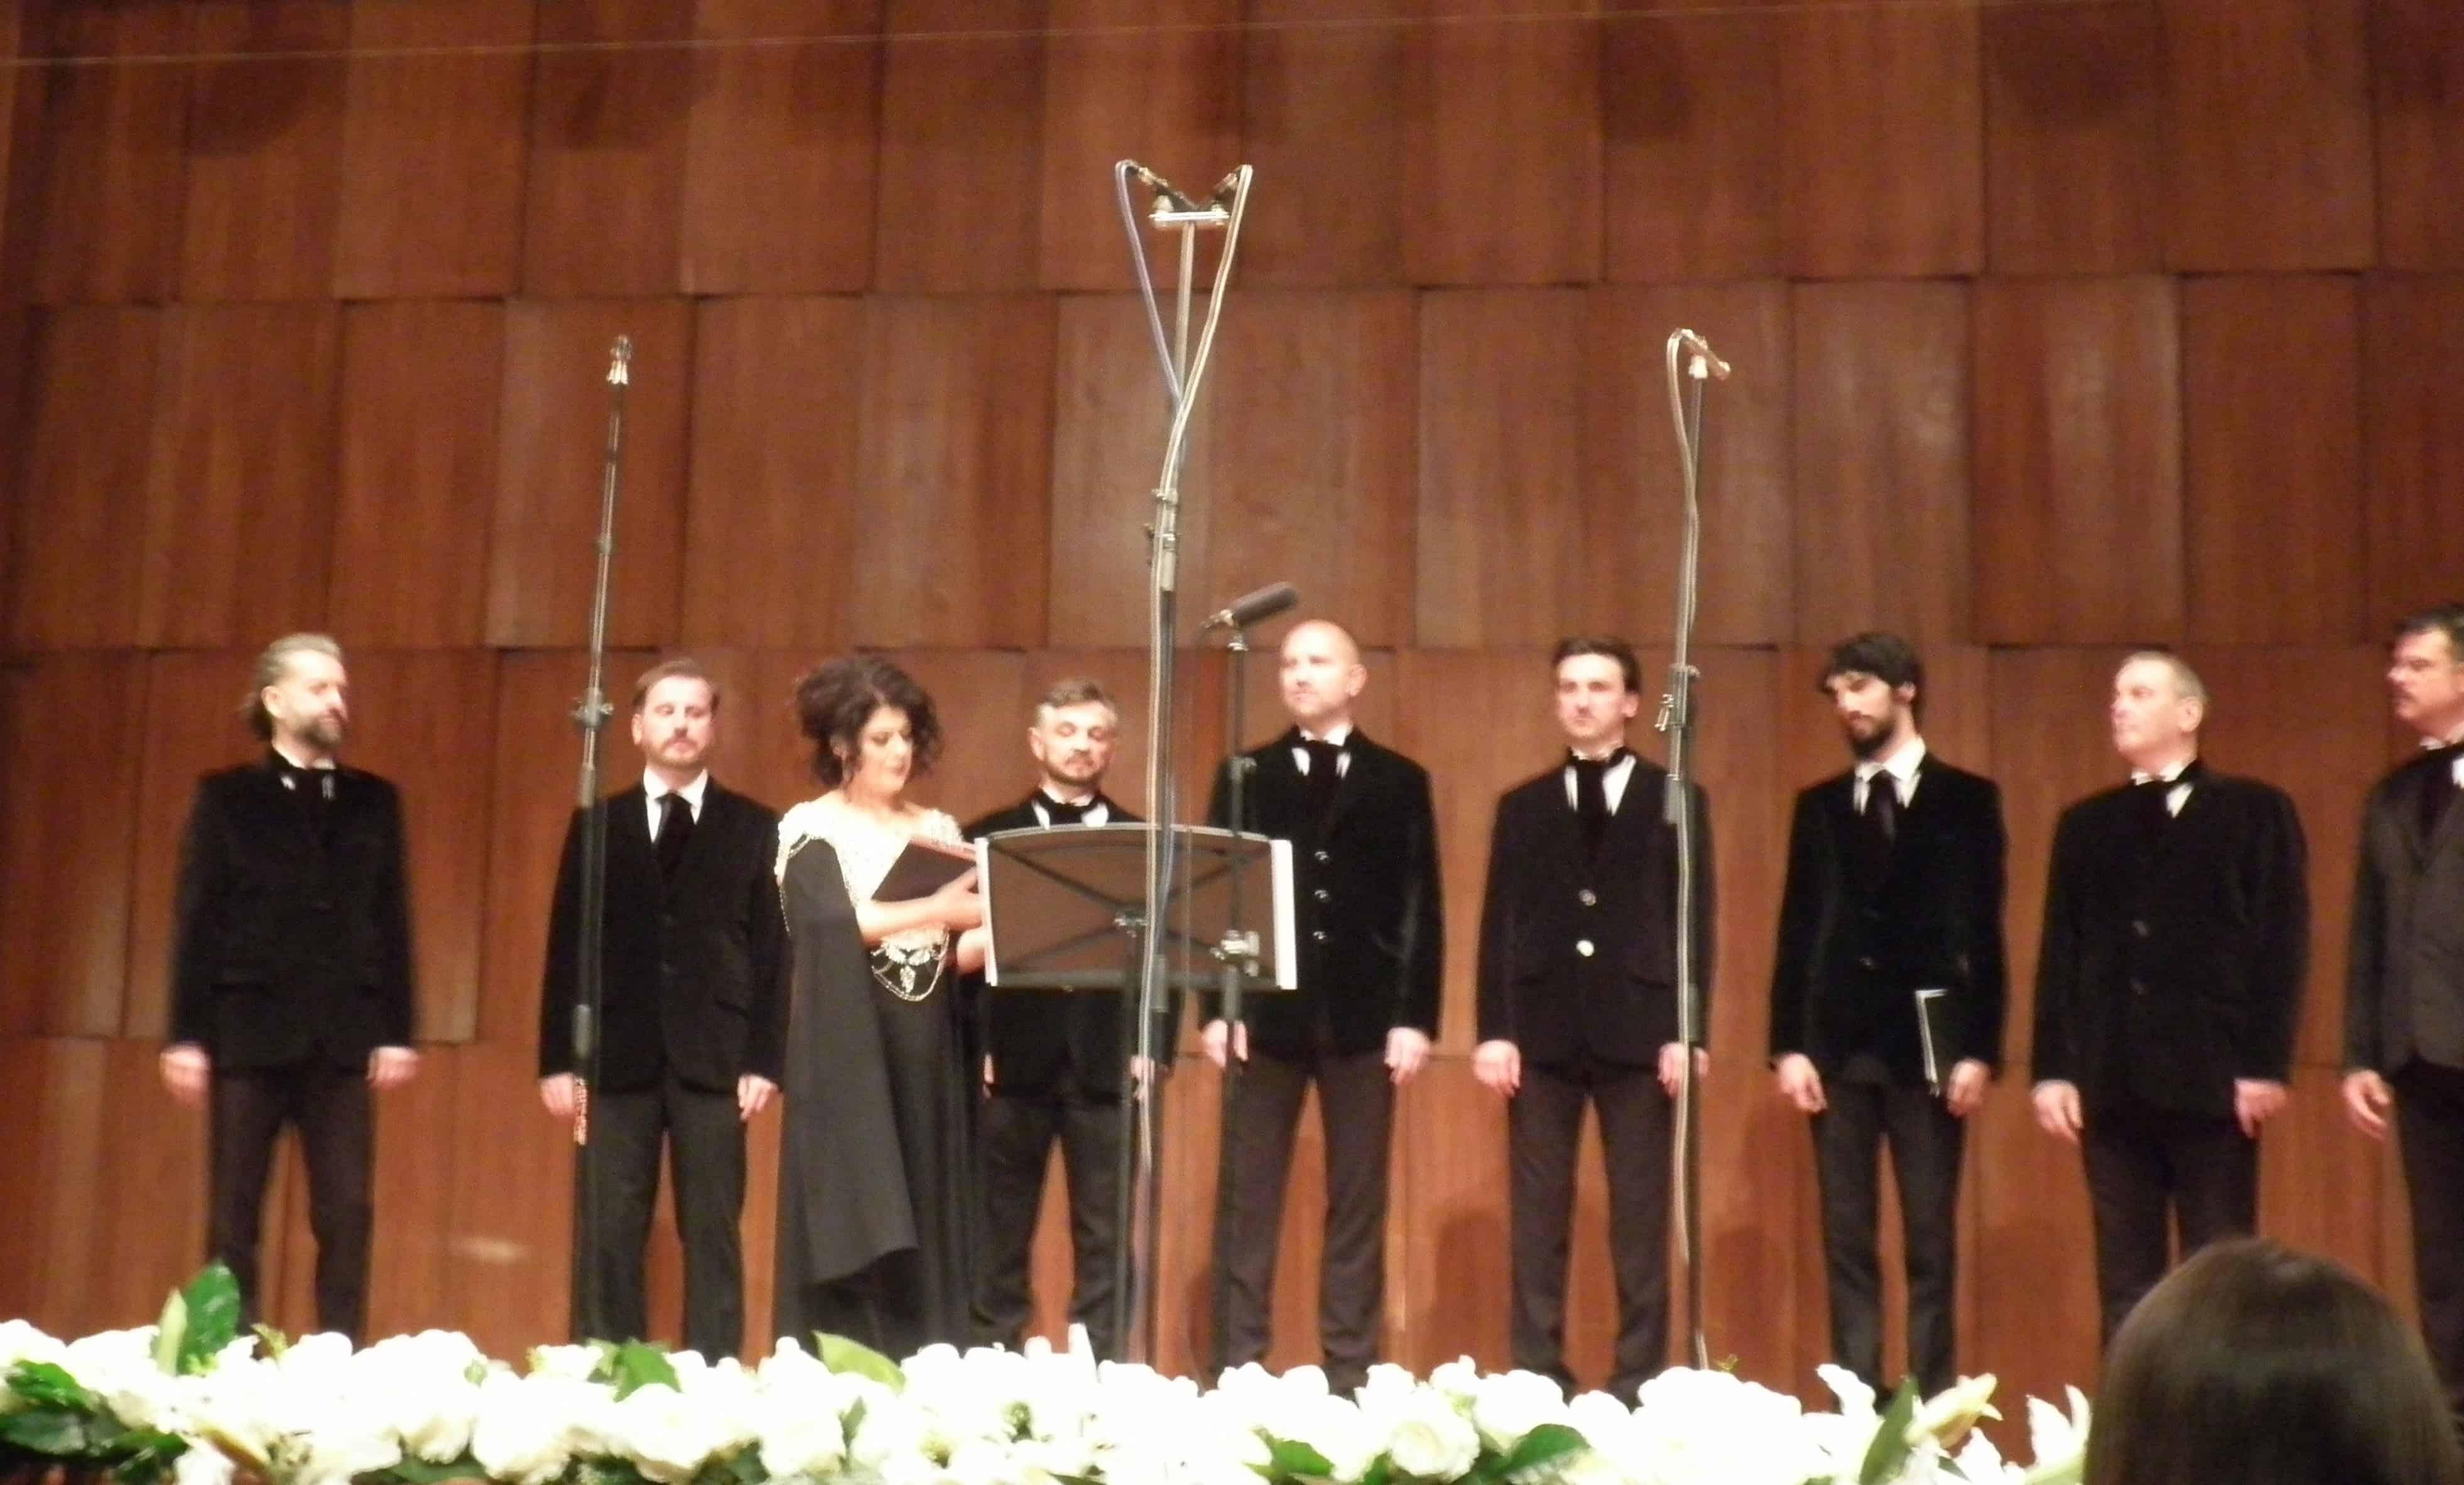 Divna Ljubojević i Melodi, Vaskršnji koncert 15.04.2018, Beograd, Zadužbina Ilije M. Kolarca